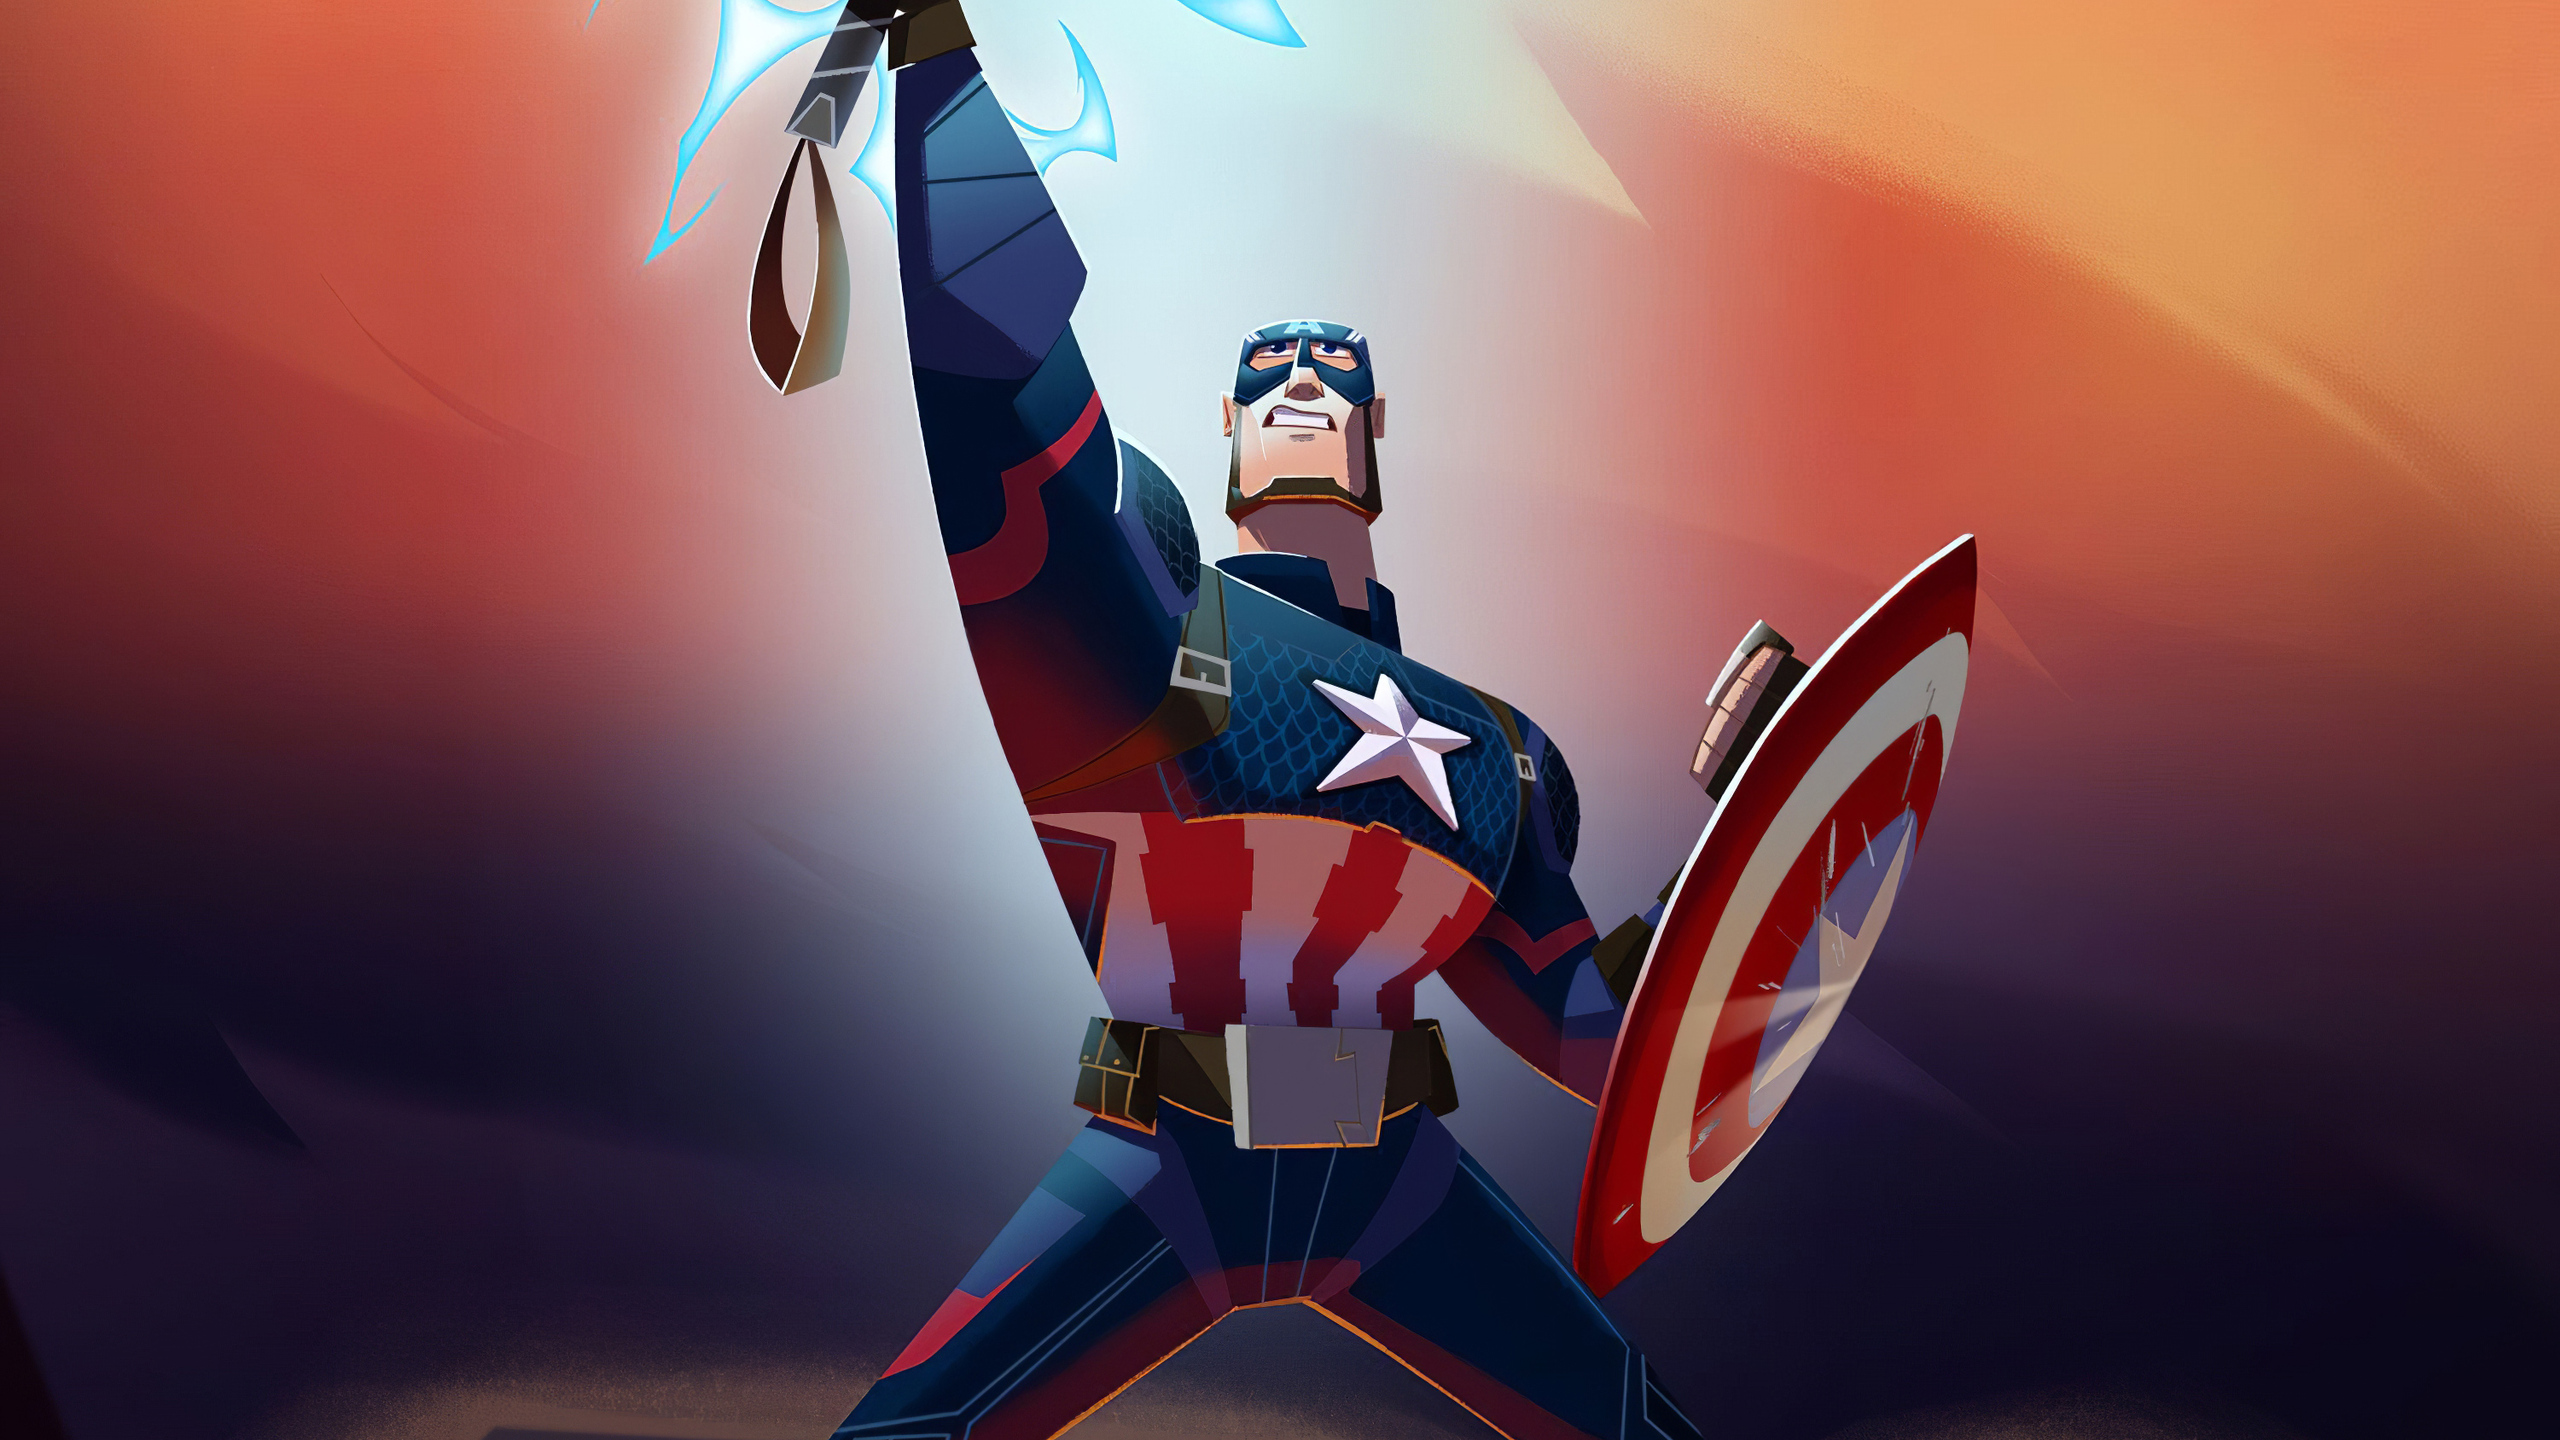 captain-america-thor-hammer-up-si.jpg